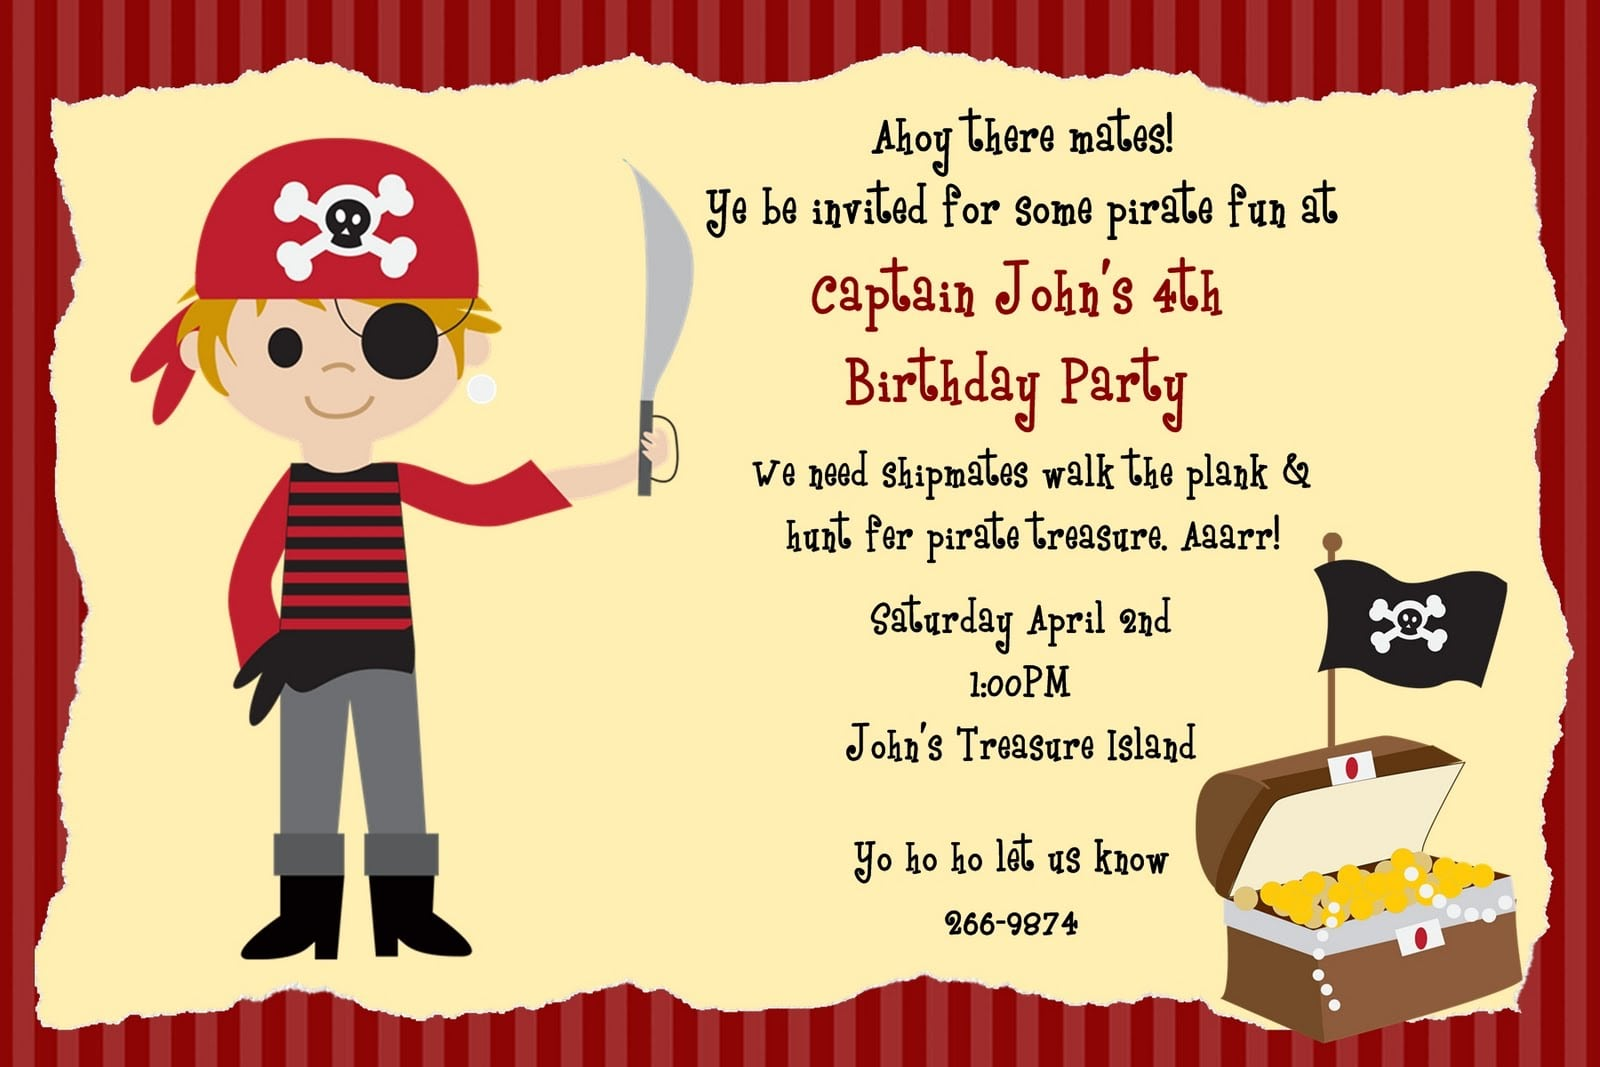 Pirate birthday party invitations templates - photo#3